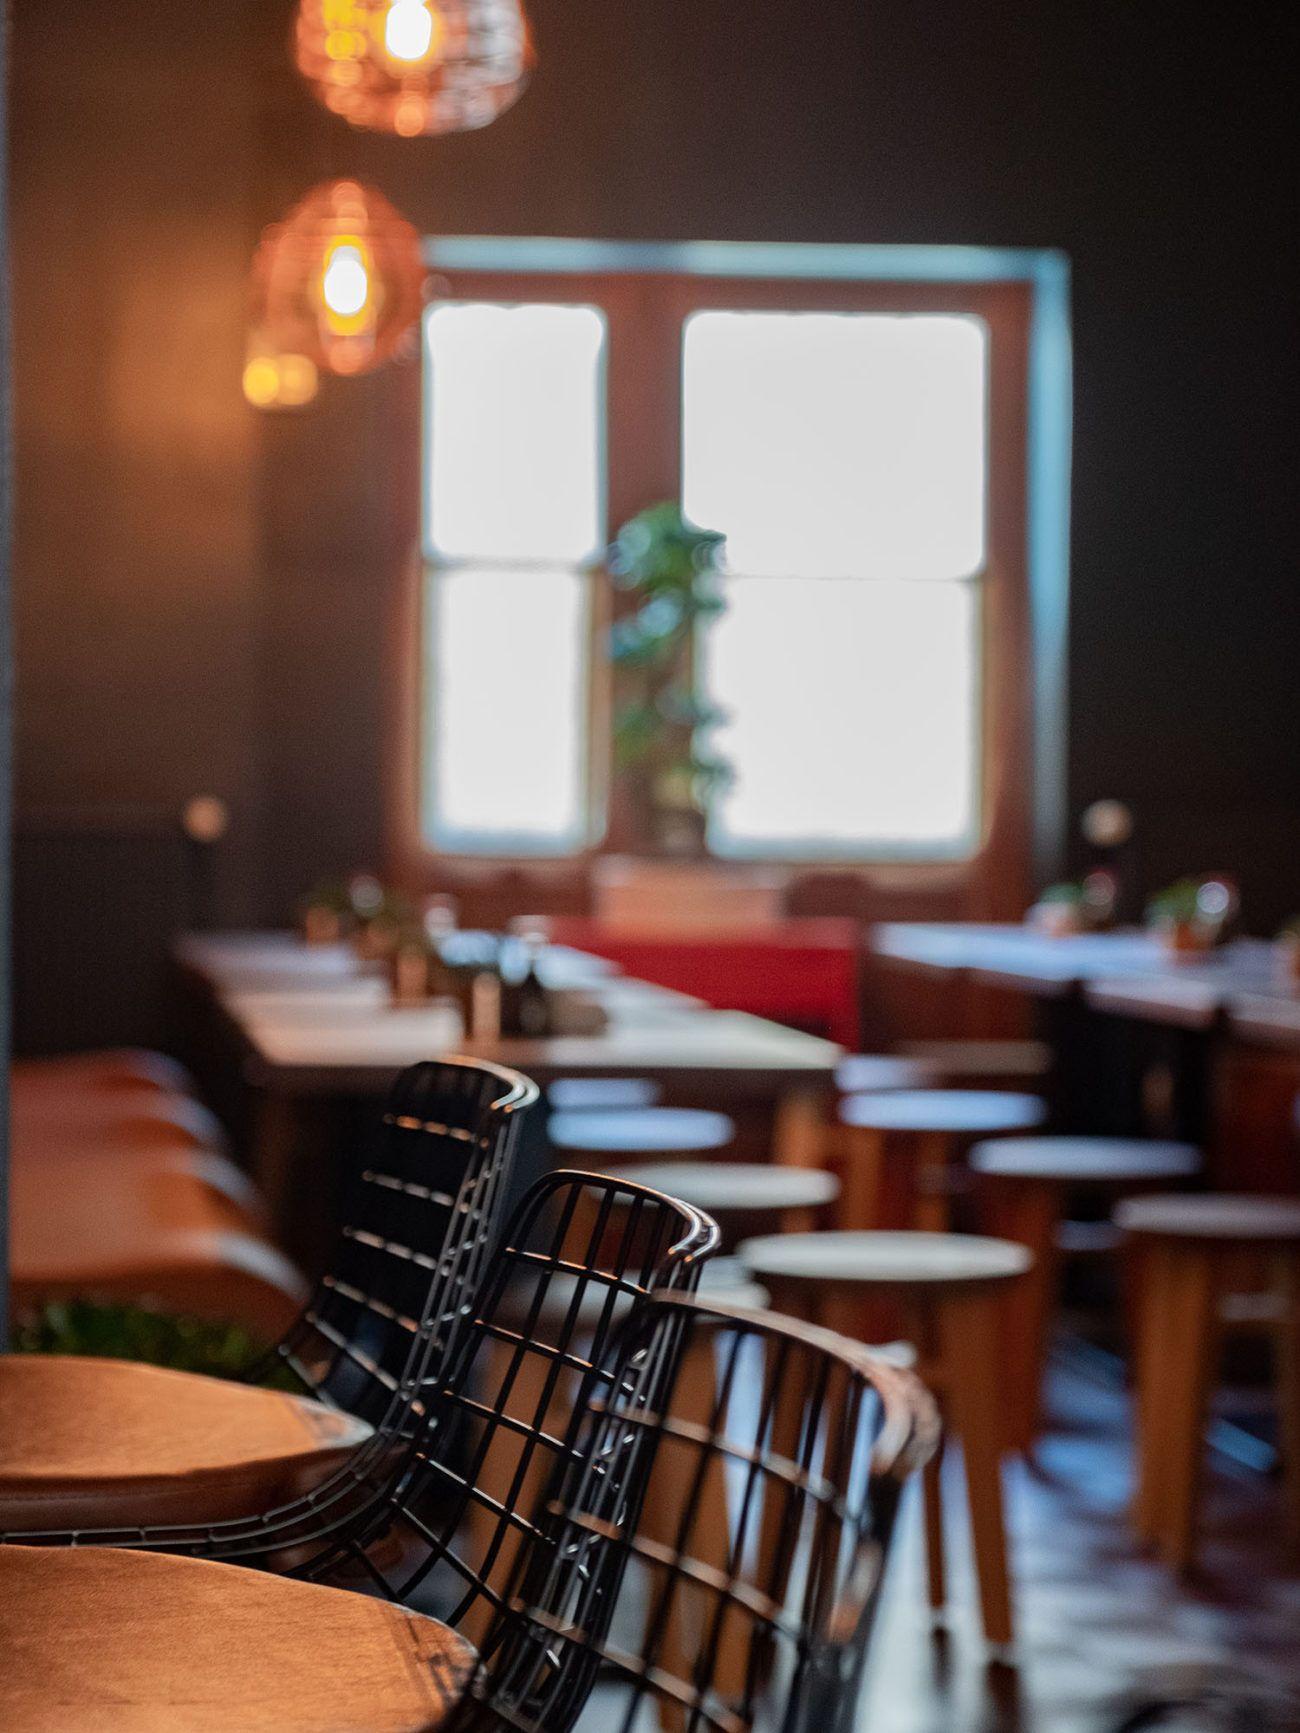 Foodblog About Fuel, Restaurant CHOTTO Berlin, Interieur